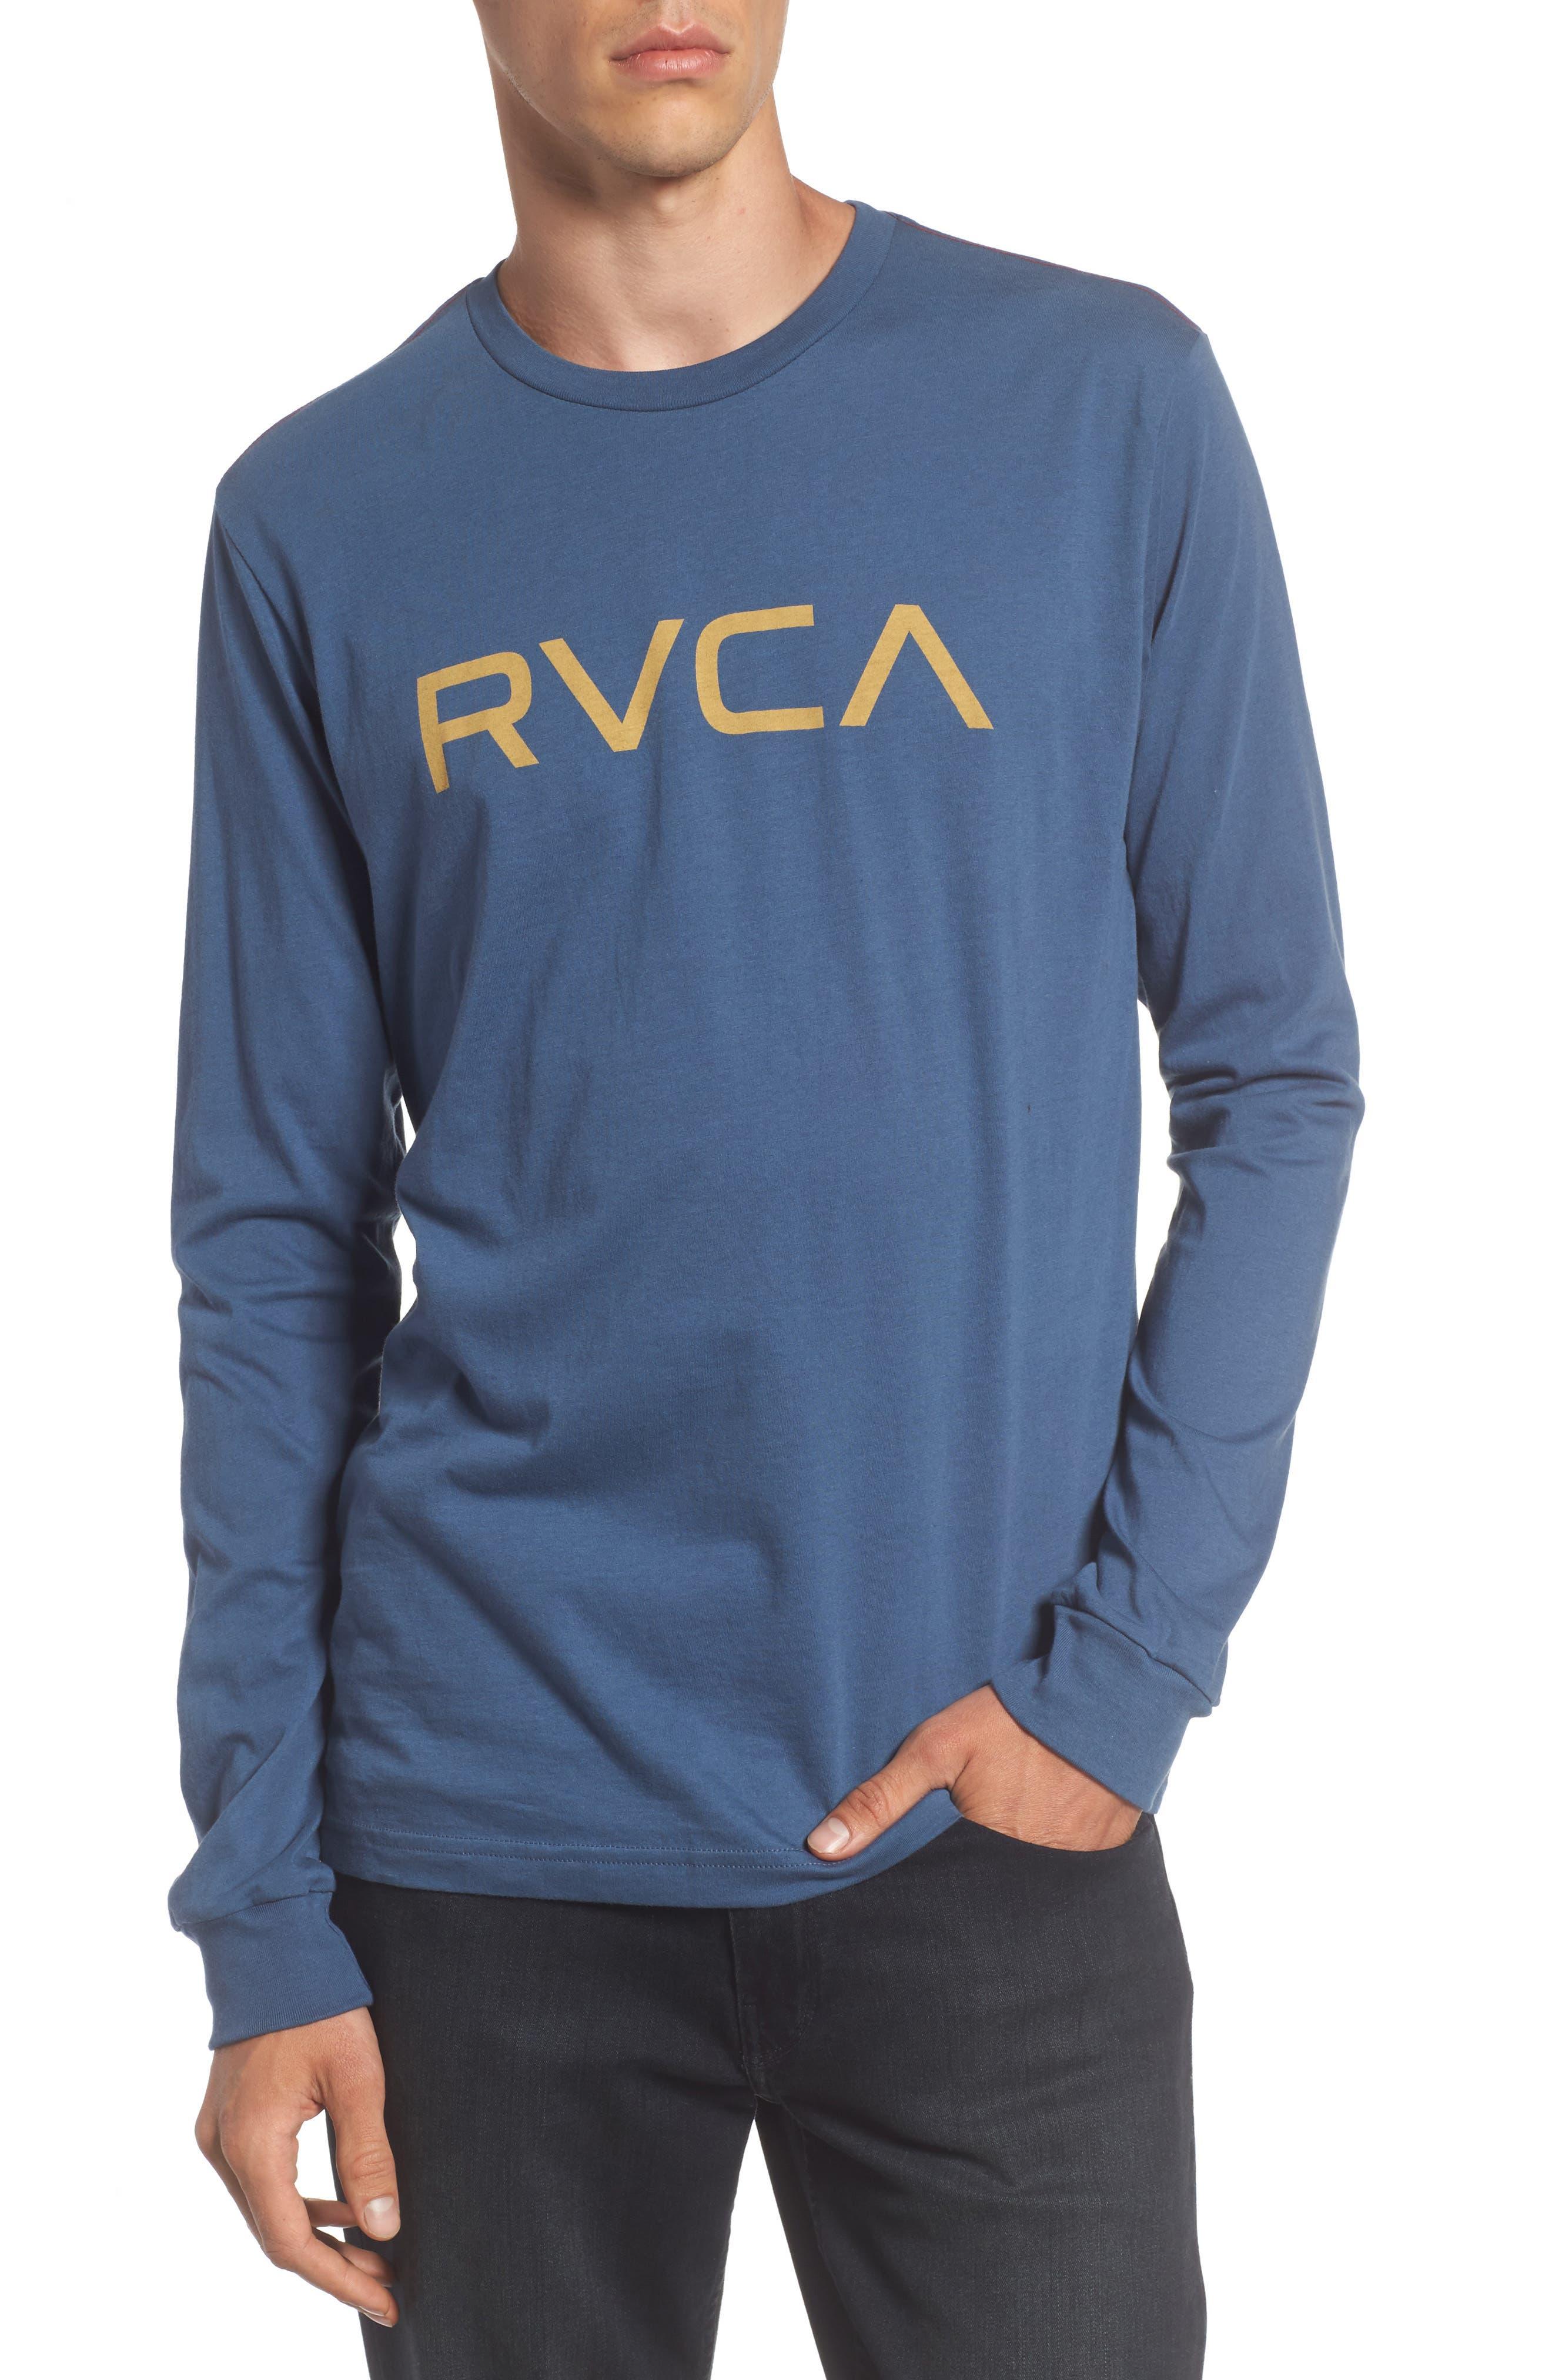 Main Image - RVCA Big RVCA Graphic T-Shirt